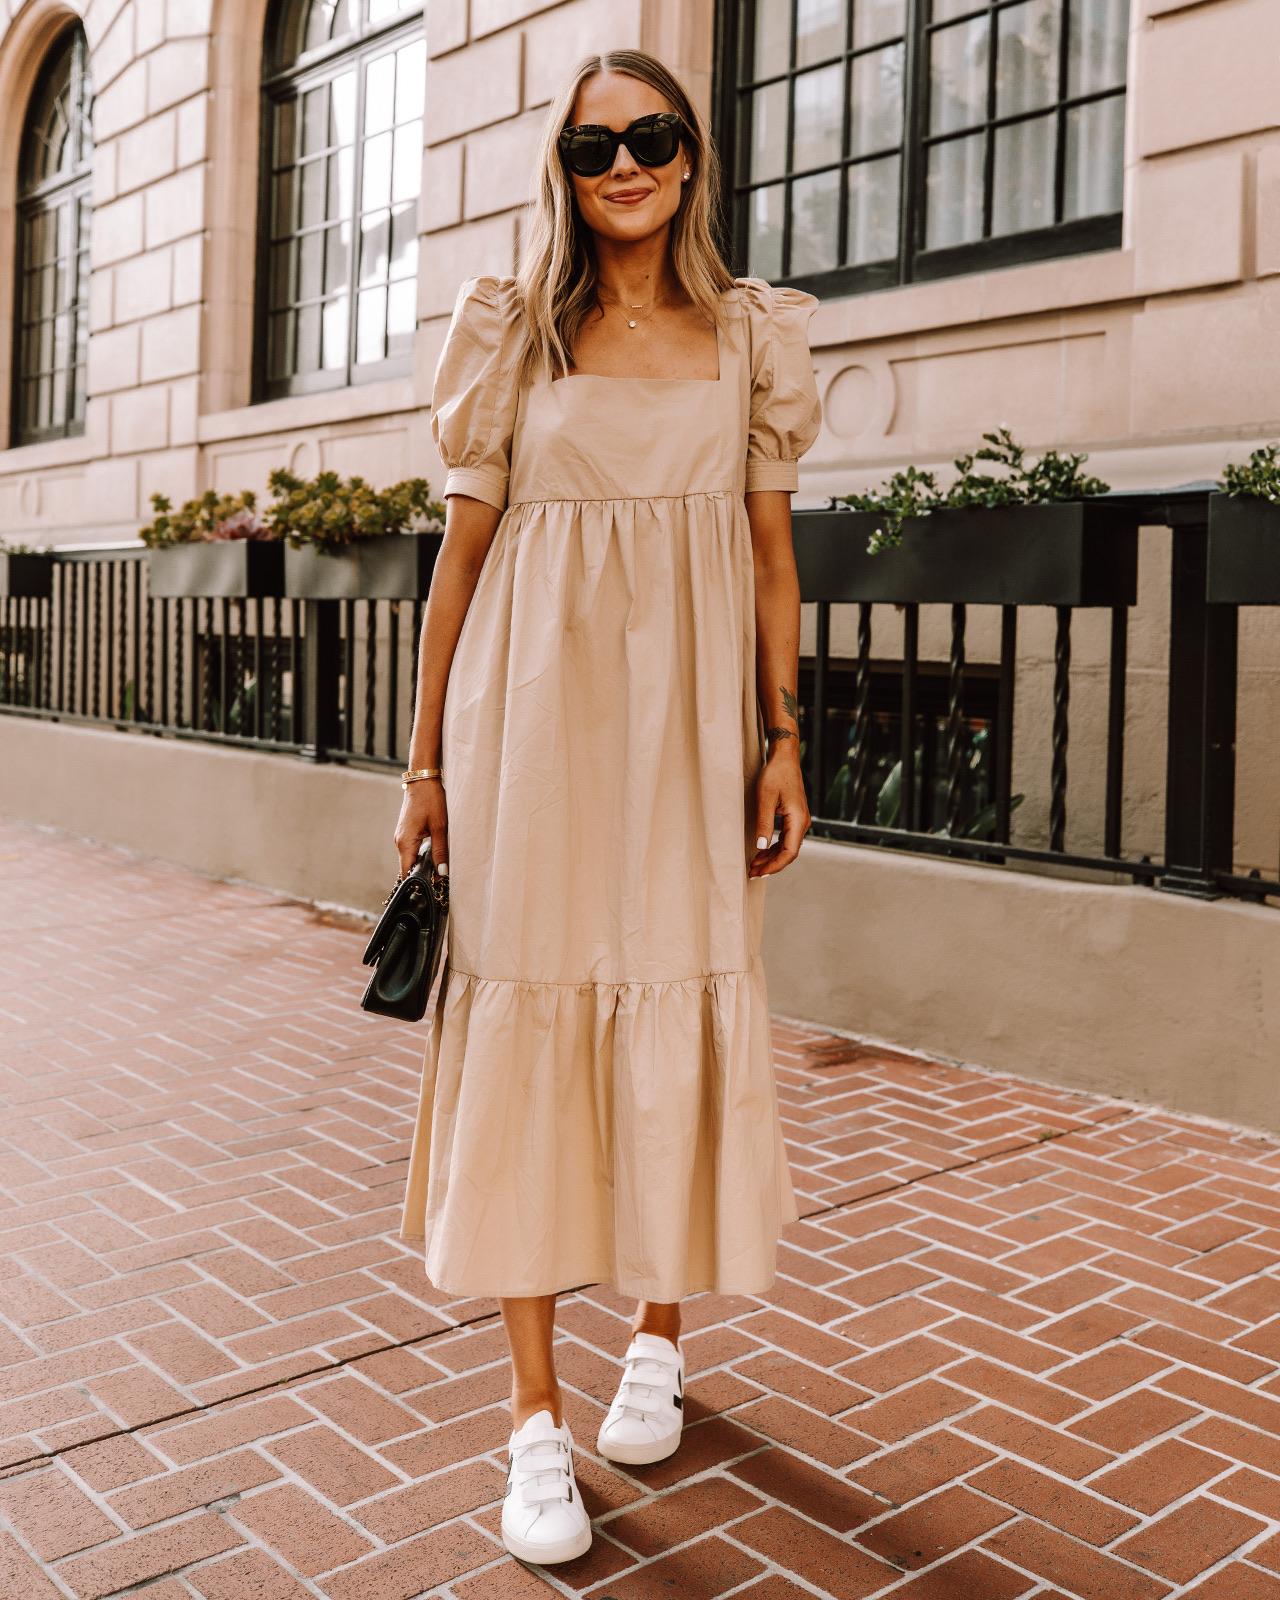 Fashion Jackson Wearing Beige Midi Dress Veja Velcro Sneakers Street Style Outfit 1